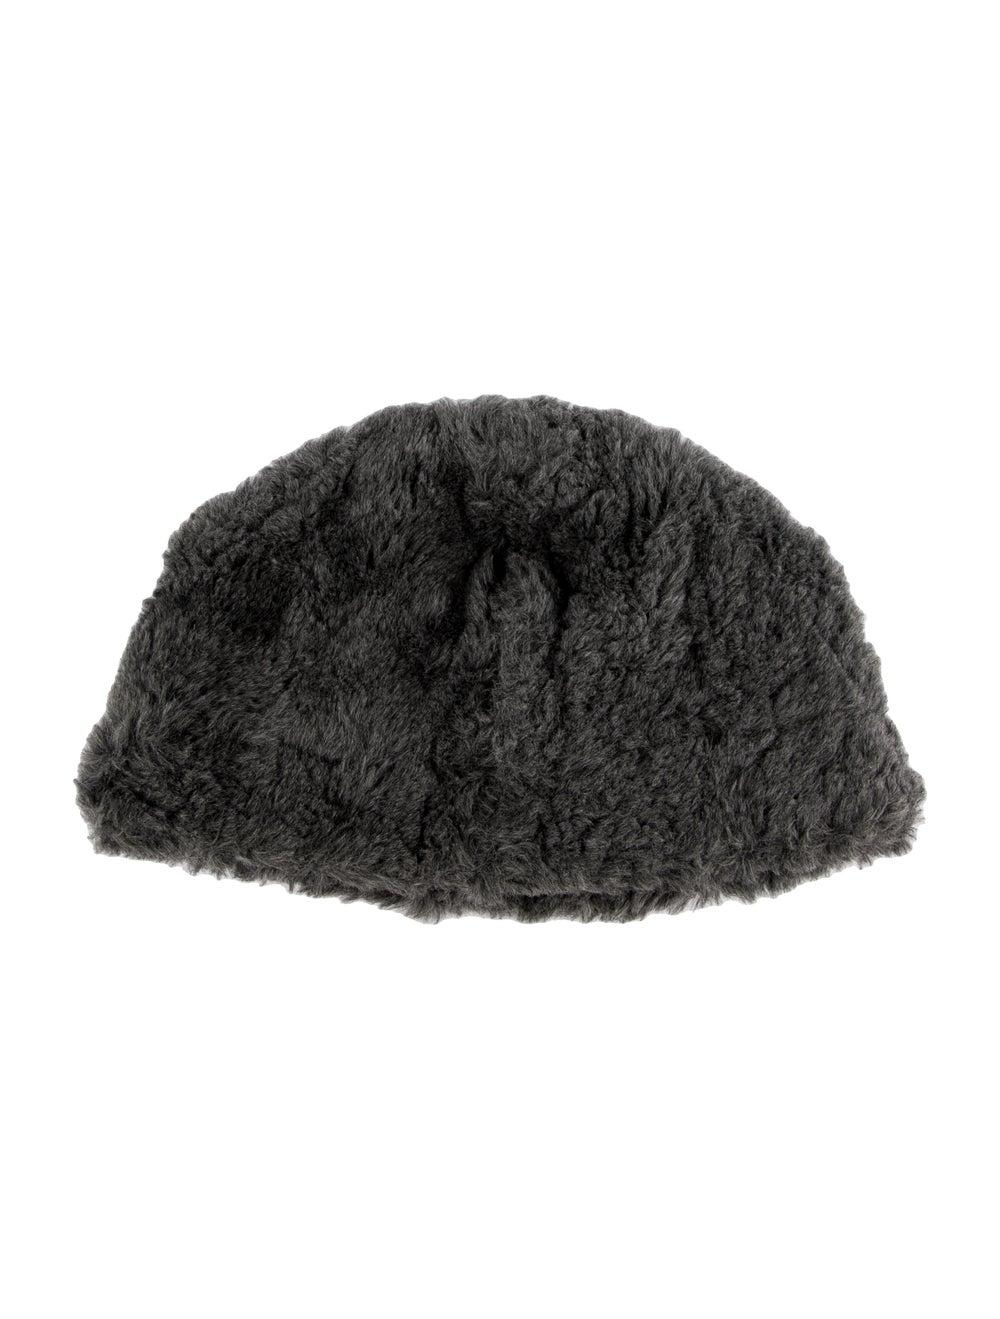 D&G Woven Logo Hat Grey - image 2